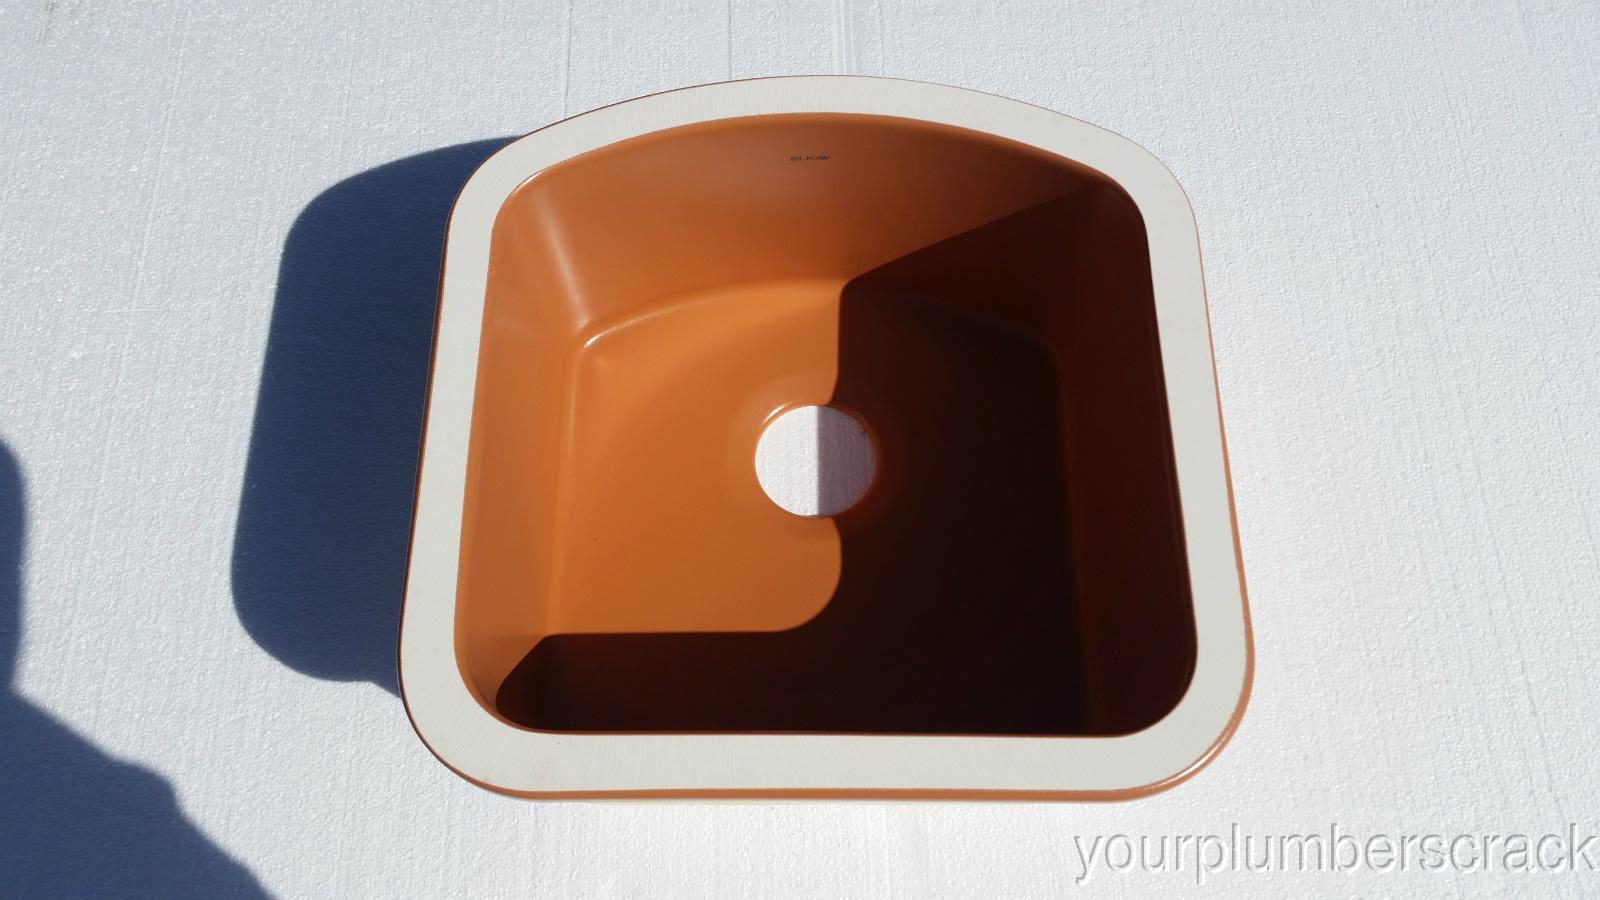 Scratch dent kitchen appliances Photo - 10